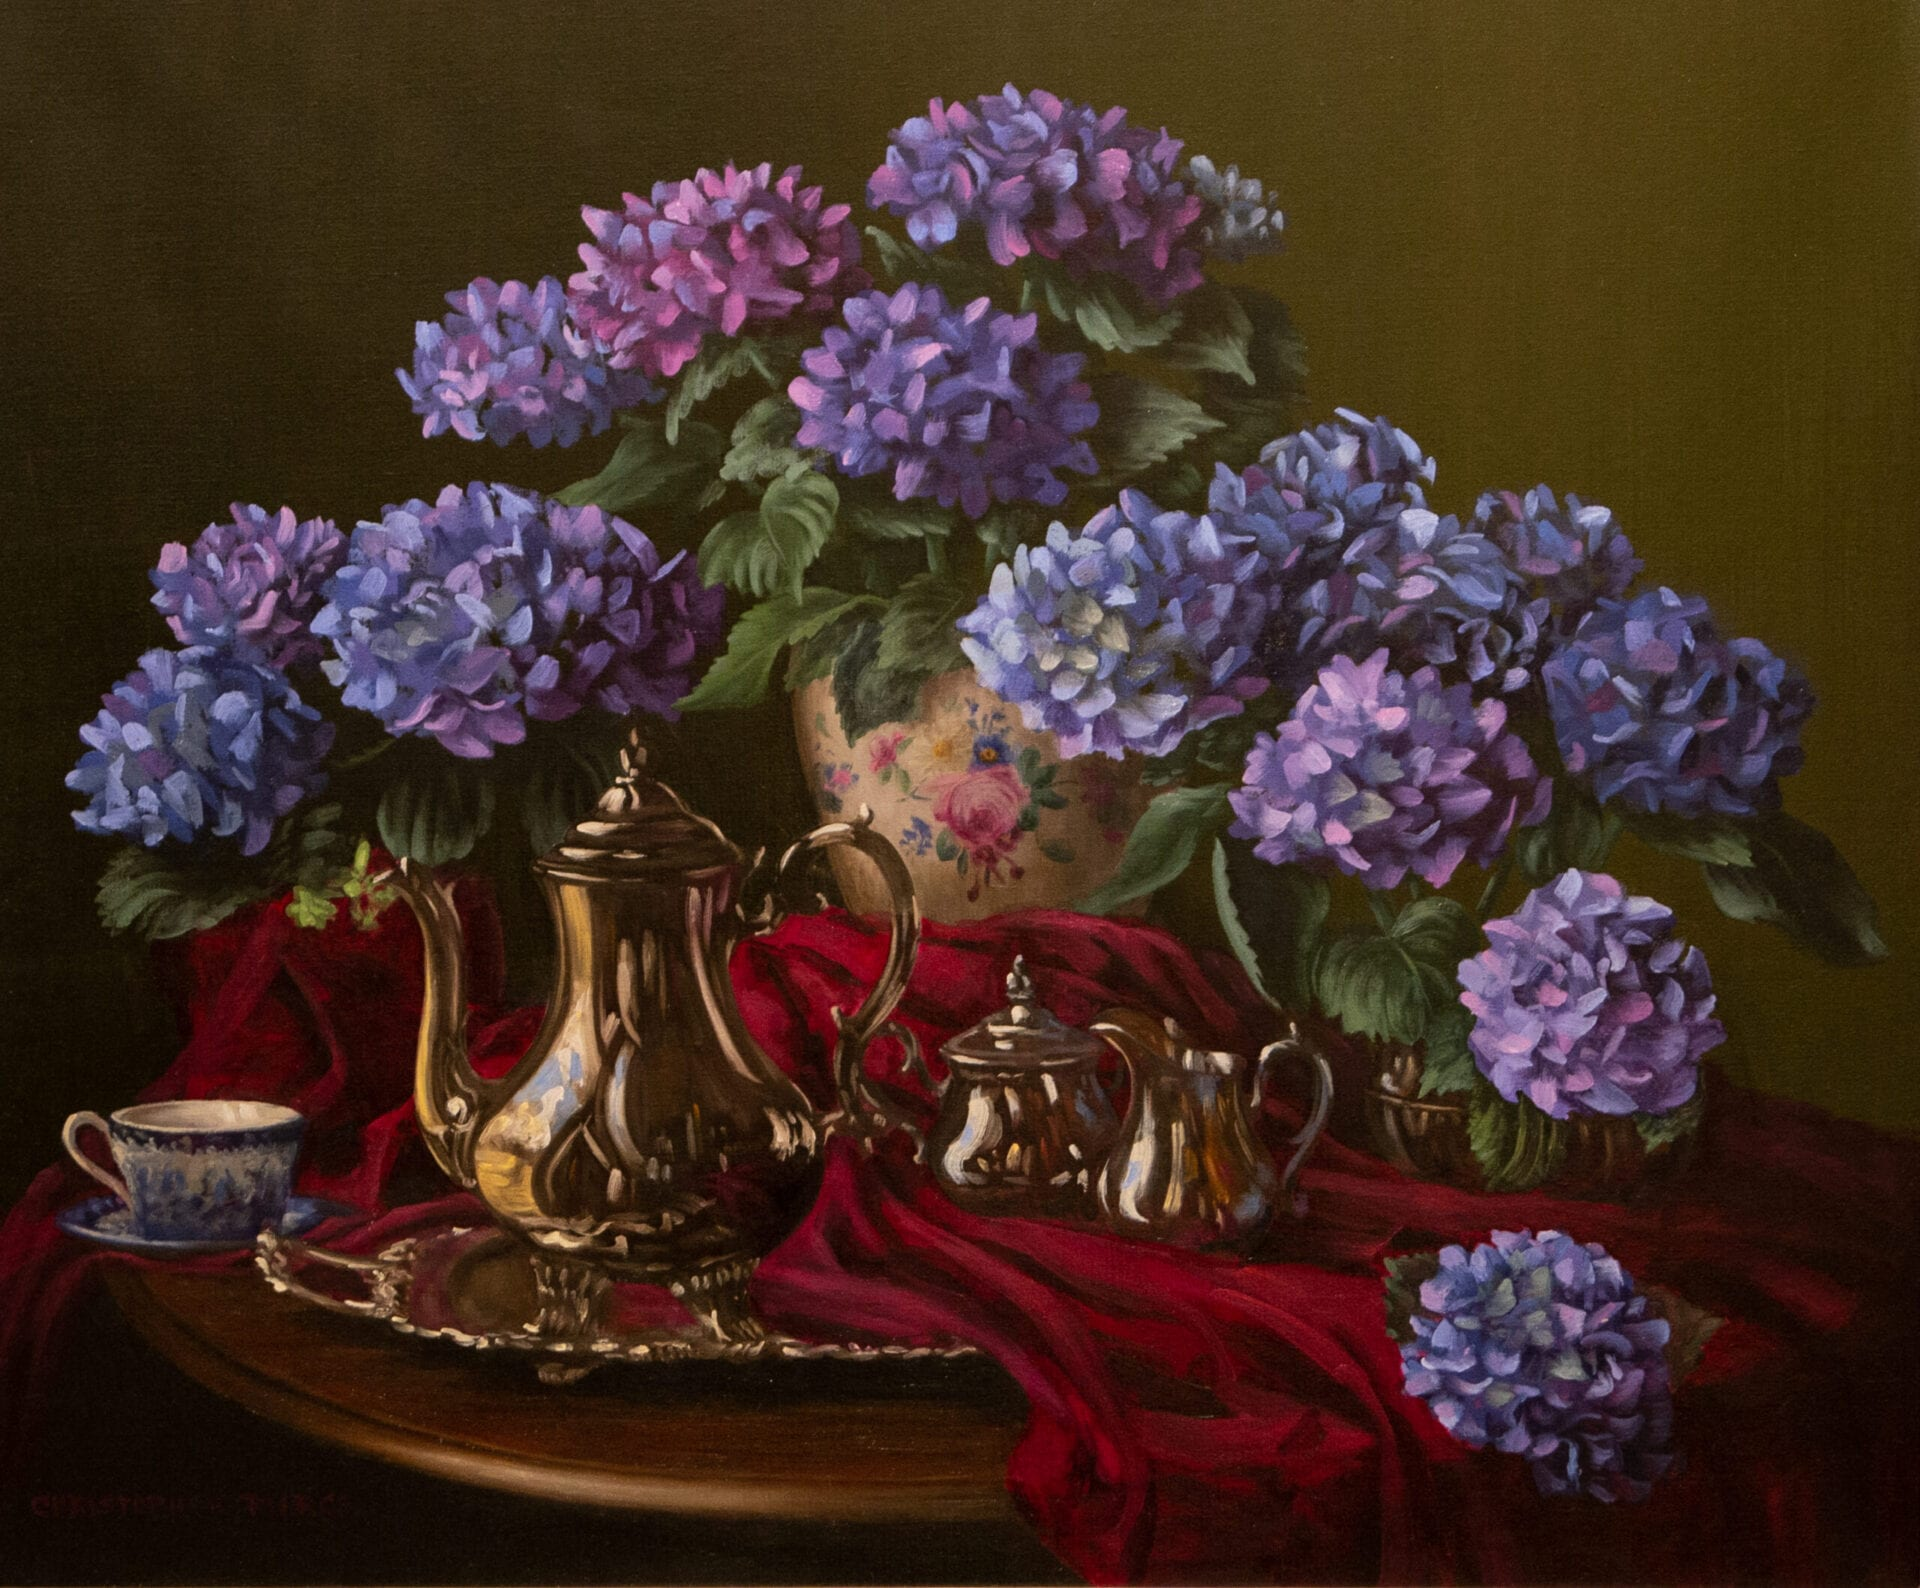 Christopher Pierce - Blue Hydrangeas and Tea